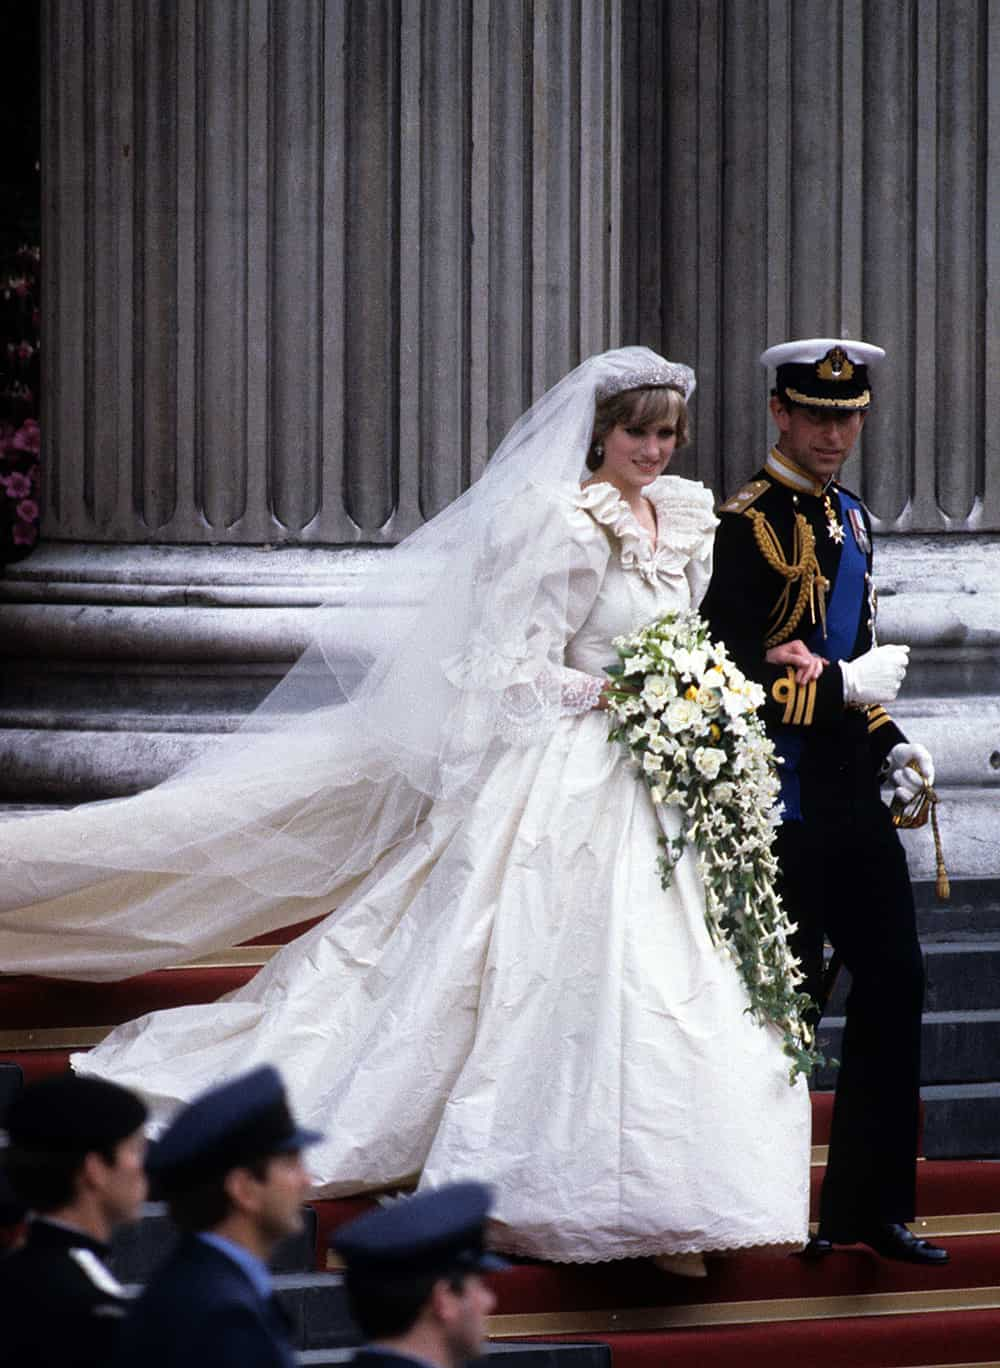 Wedding of Princess Diana of Wales.